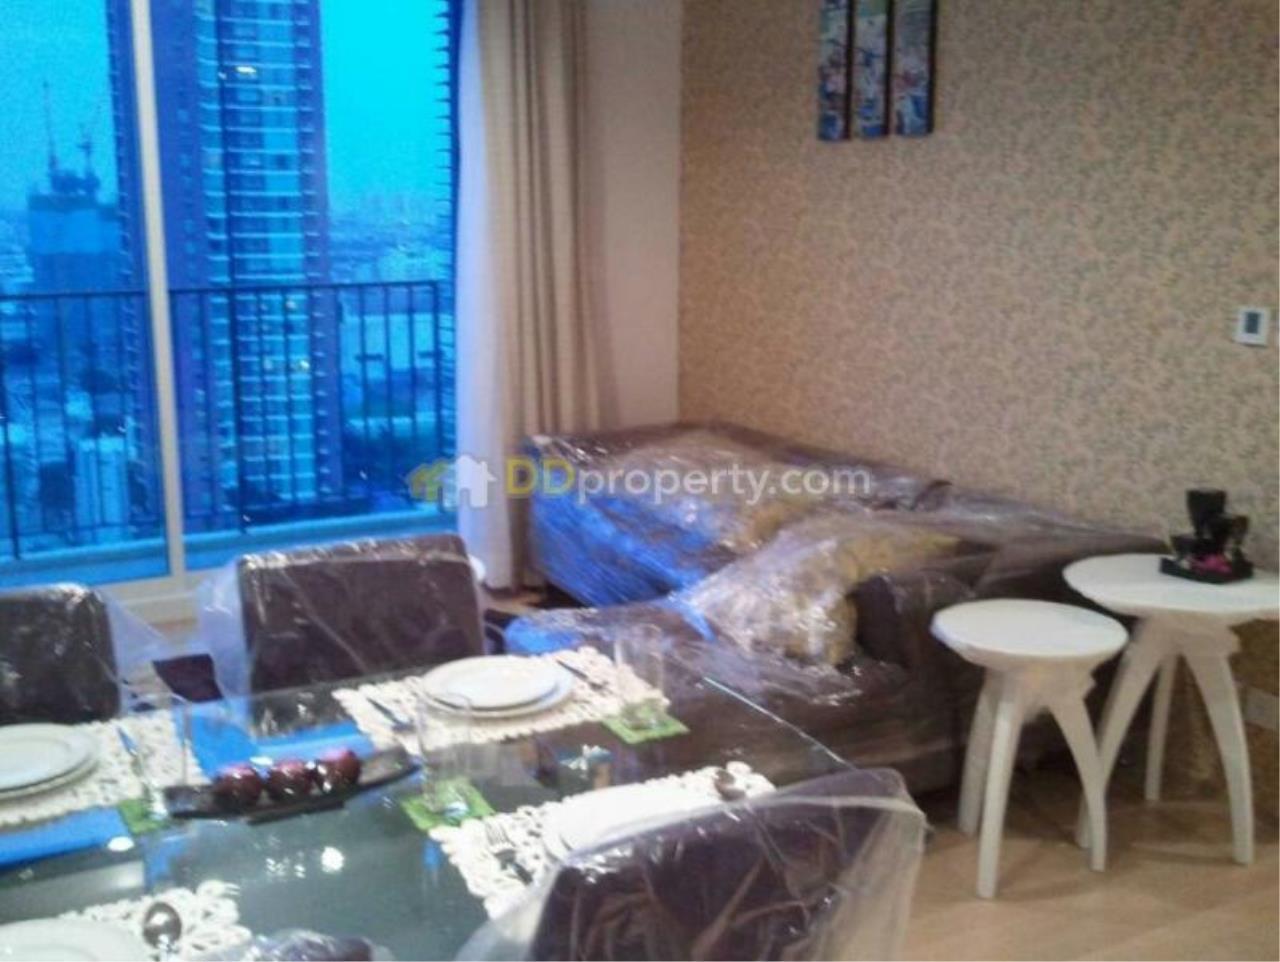 Quality Life Property Agency's Rent New Condo Siri At Sukhumvit Condominium 3